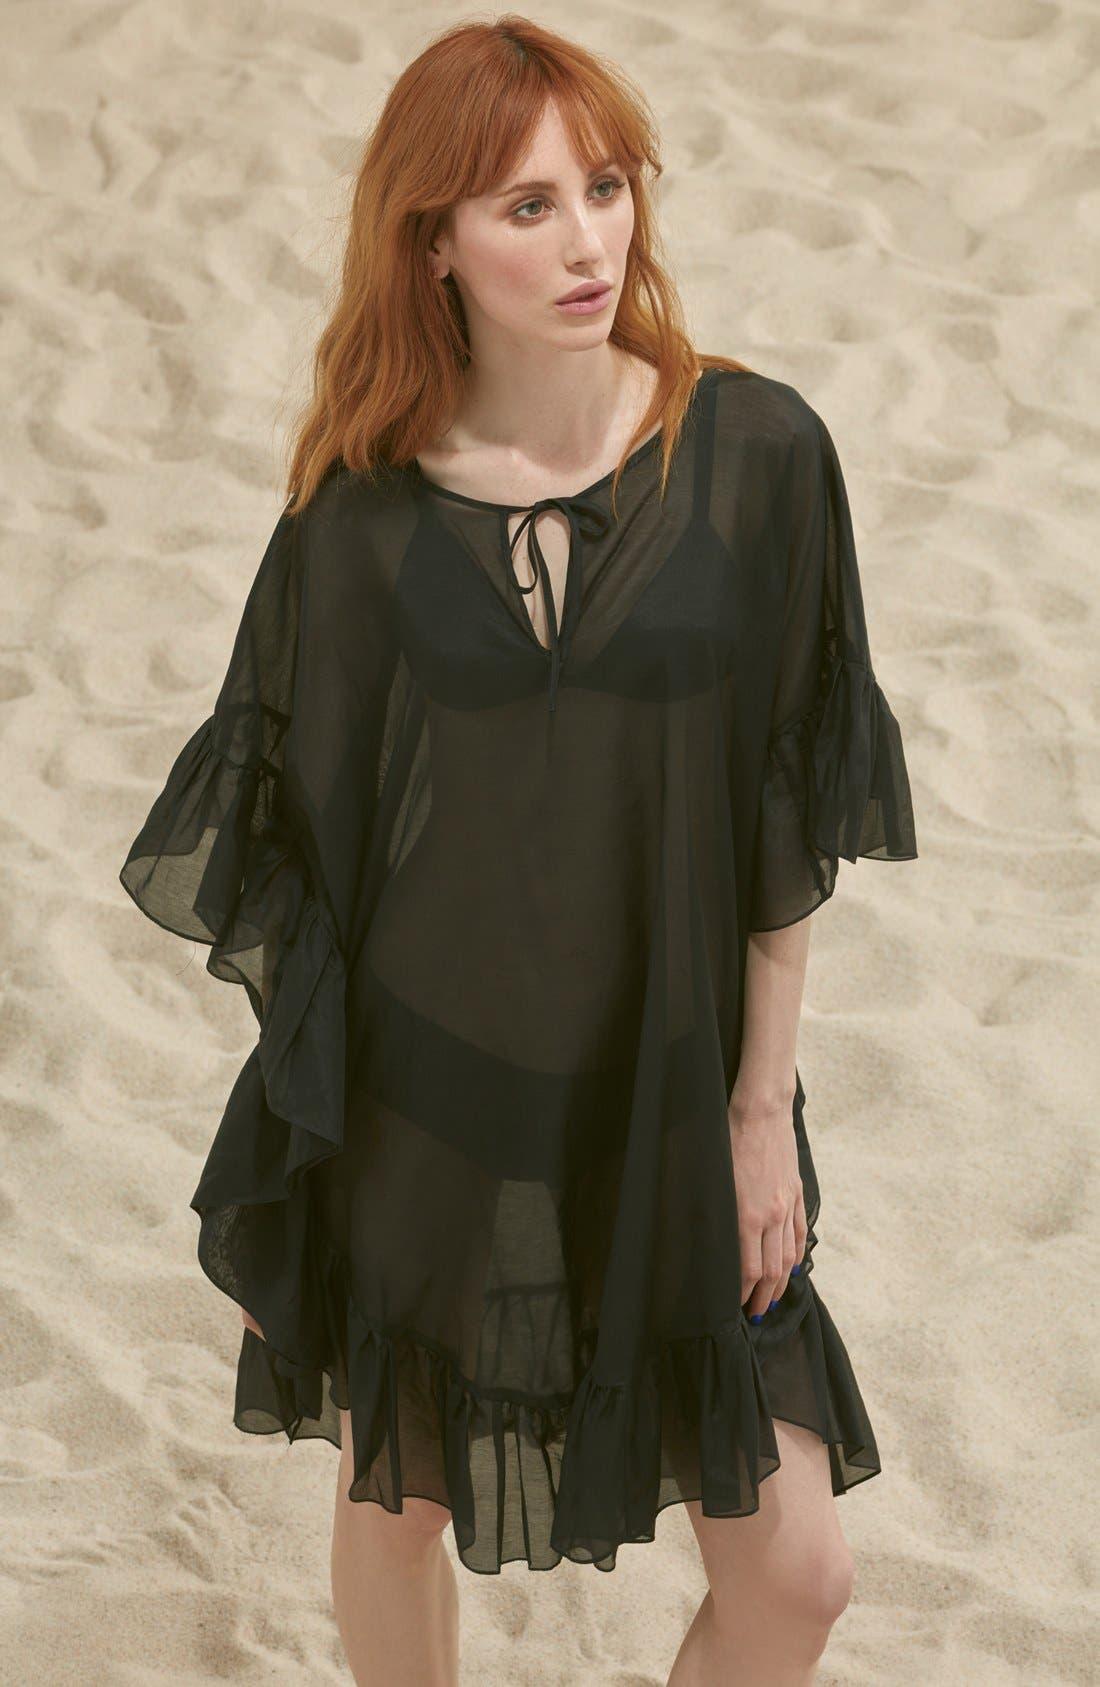 Alternate Image 1 Selected - Soler 'Yasmine' Frill Tie Cover-Up Caftan